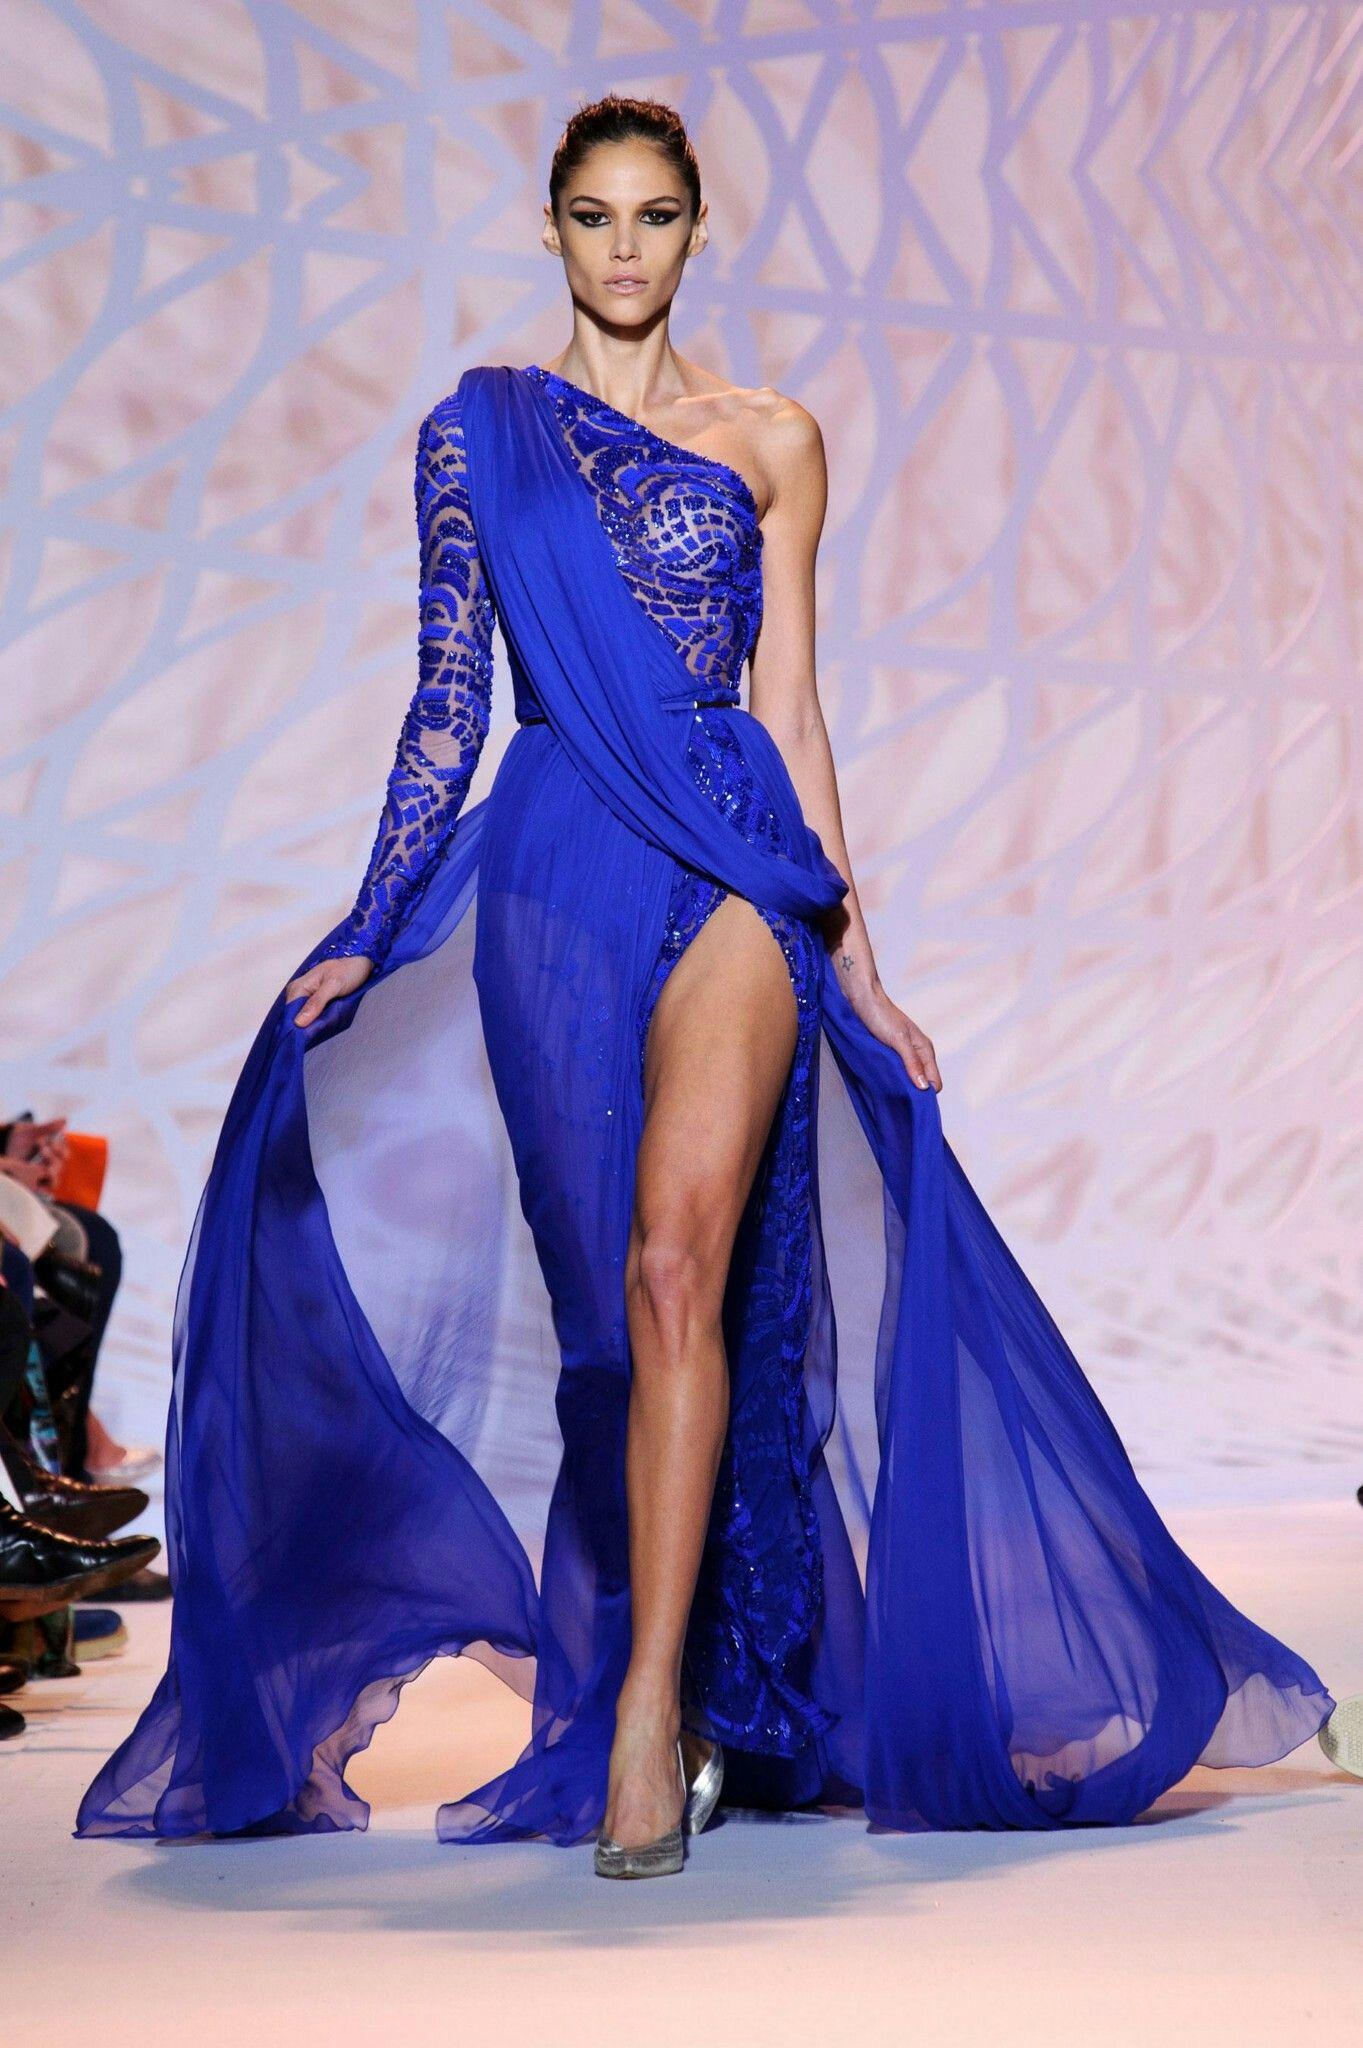 Pin de Marco Baile en blue dress | Pinterest